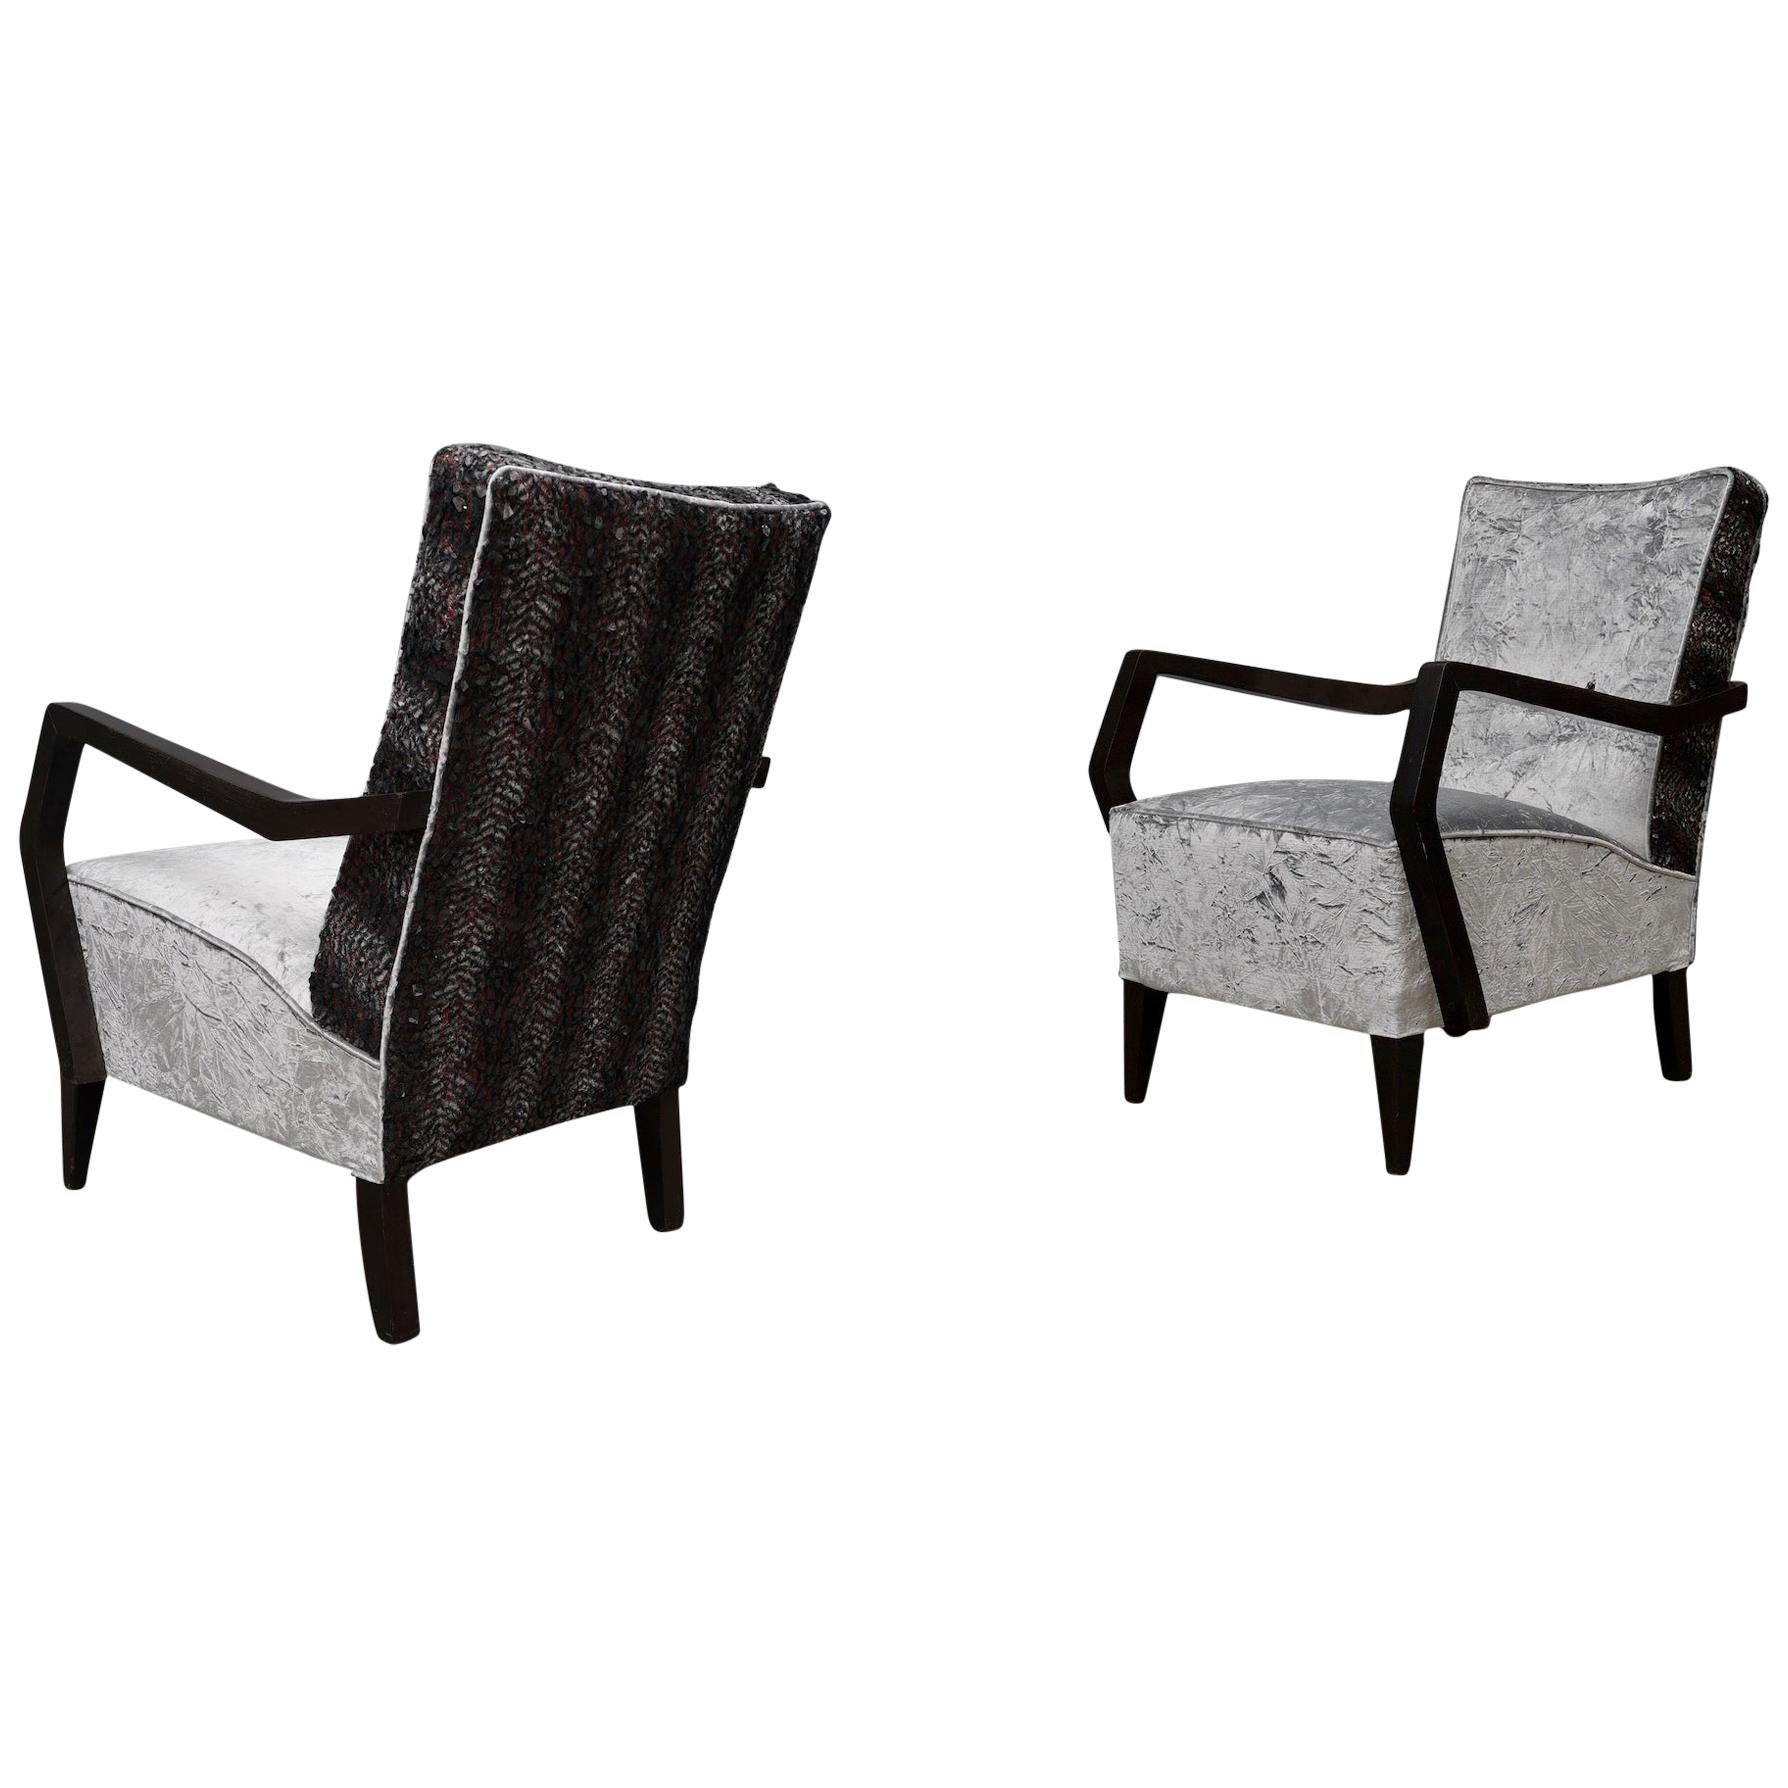 Midcentury Beechwood and Velvet Italian Armchairs, 1950